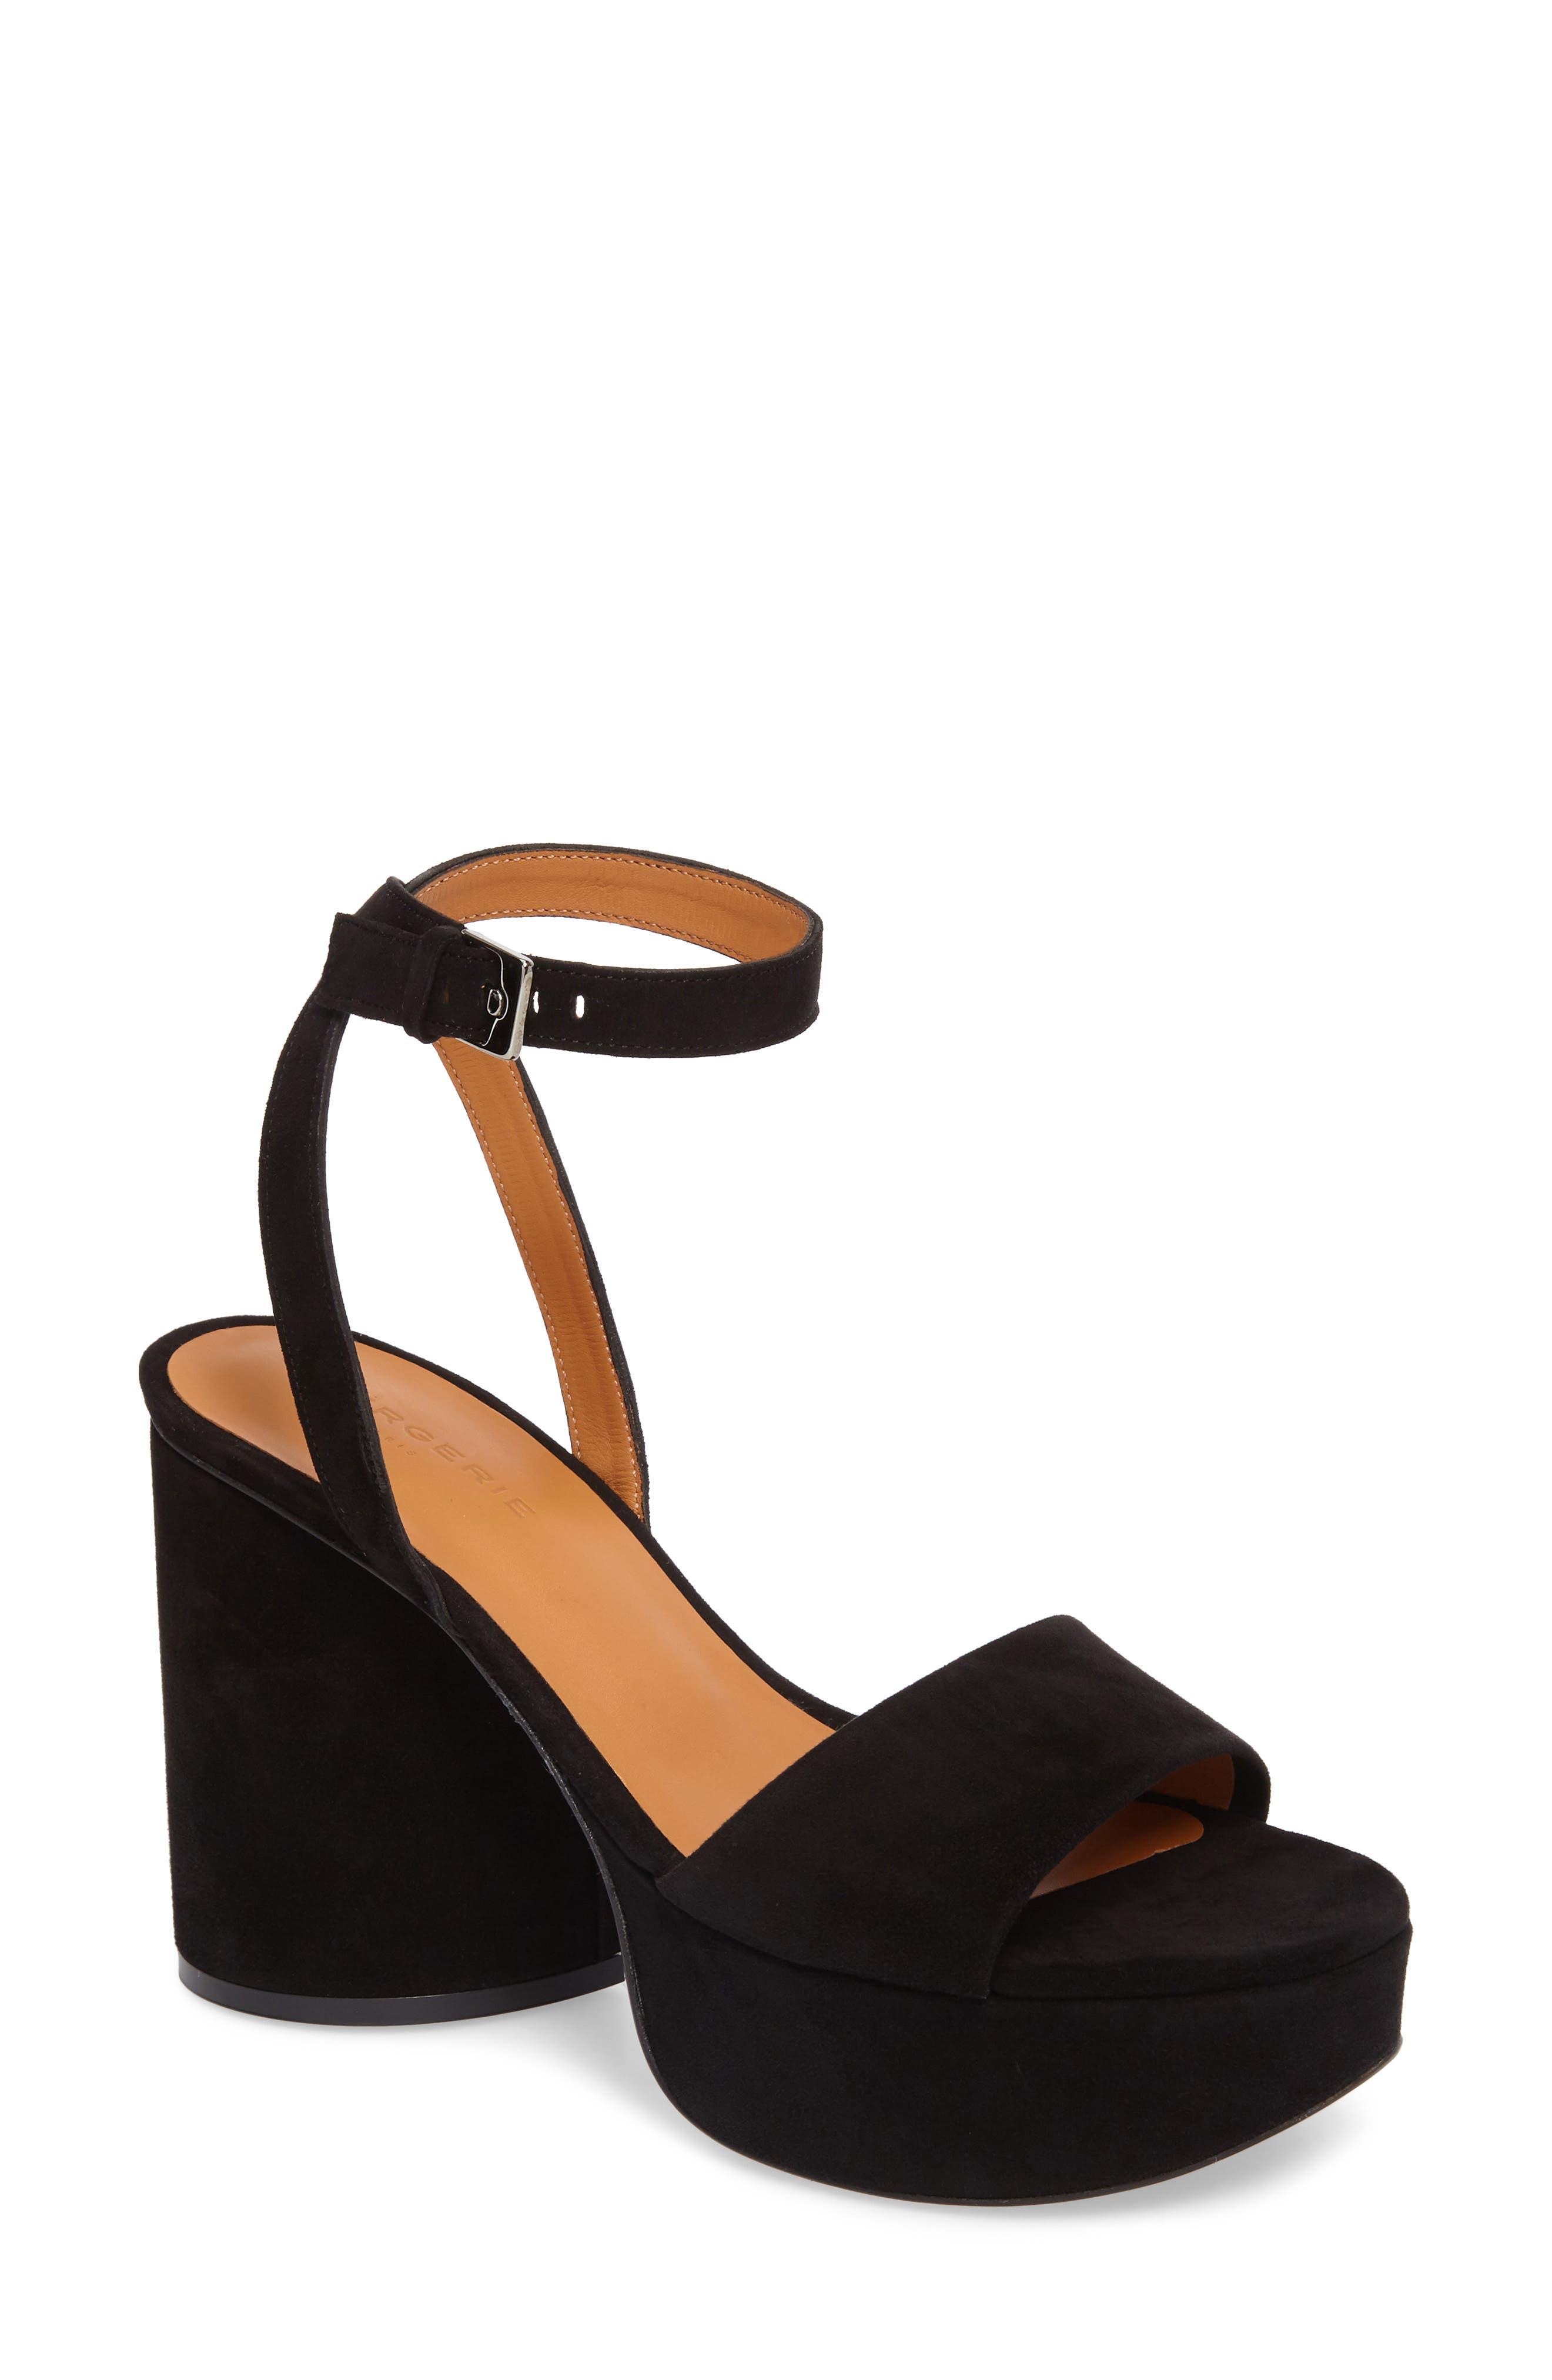 Vionica Platform Ankle Strap Sandal,                         Main,                         color, 001